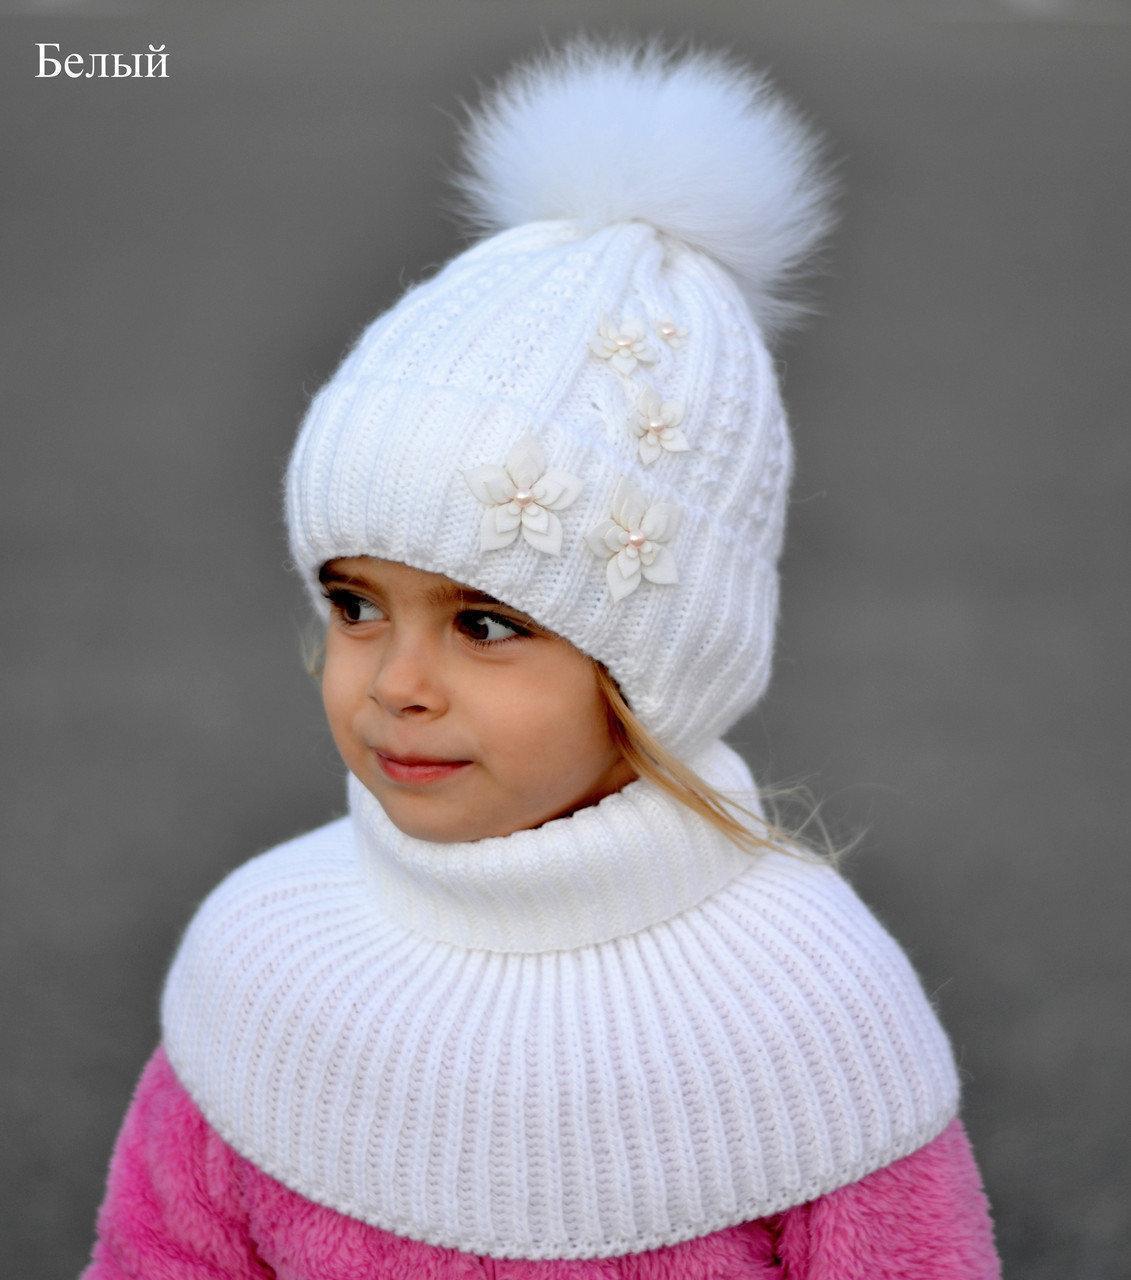 Манишка для ребенка